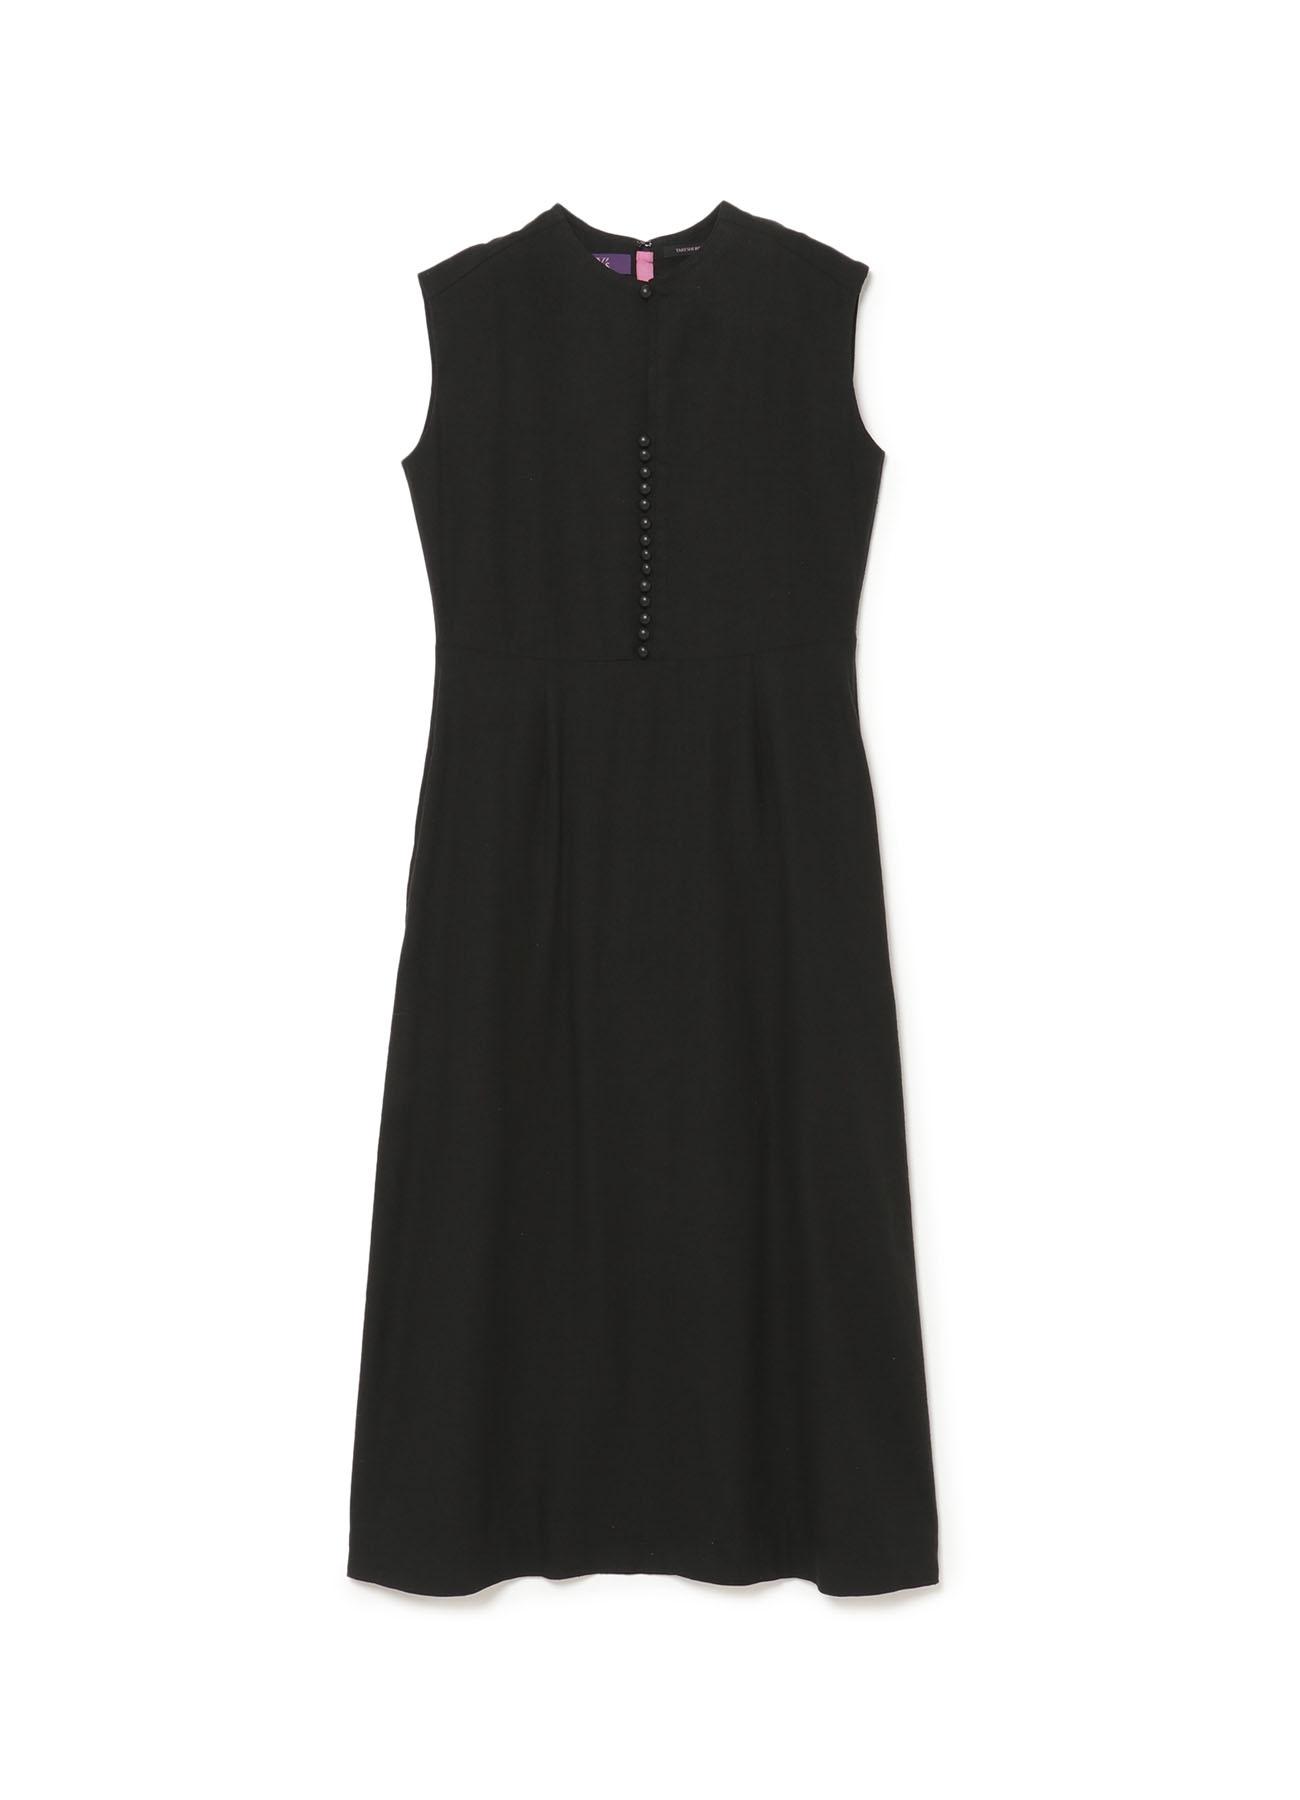 Shabby chic silk Linen Cloth 球釦ノースリーブドレス